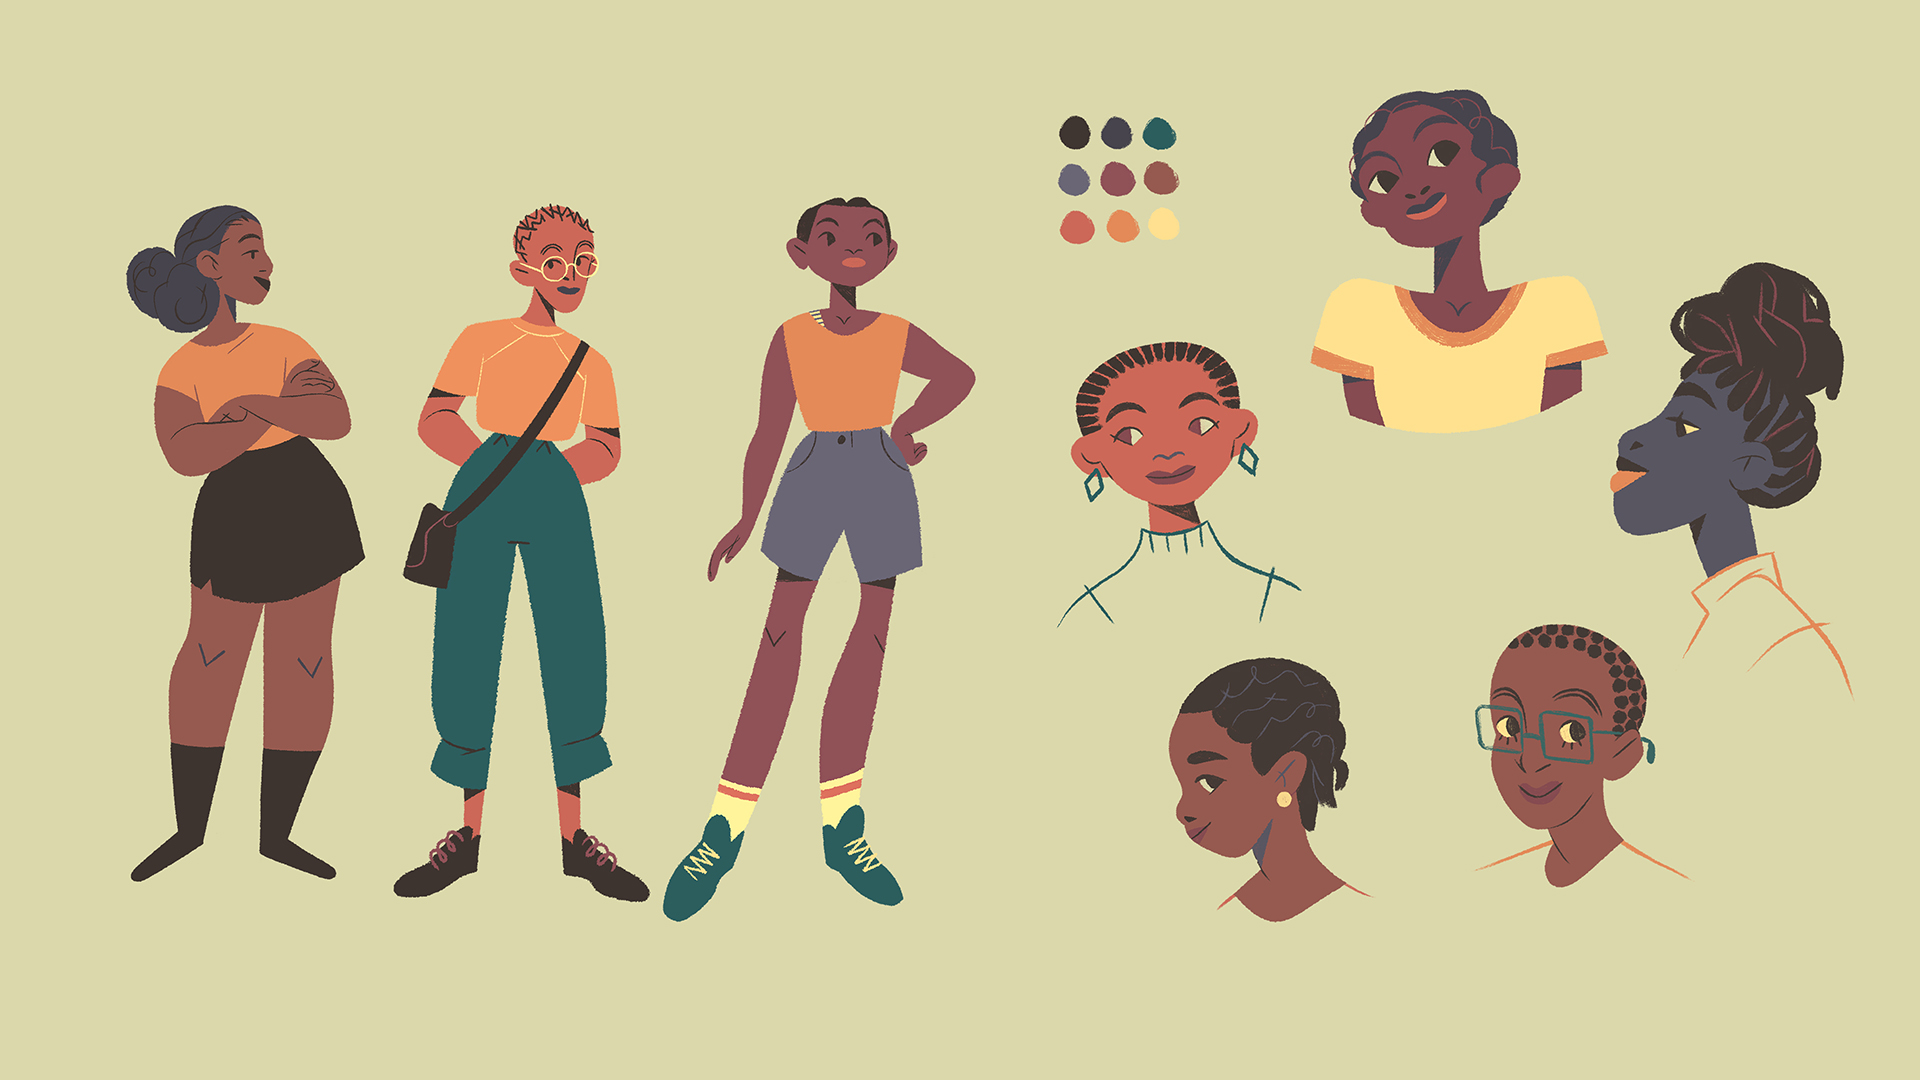 tom-goyon-character-design-ugandan-girls-01